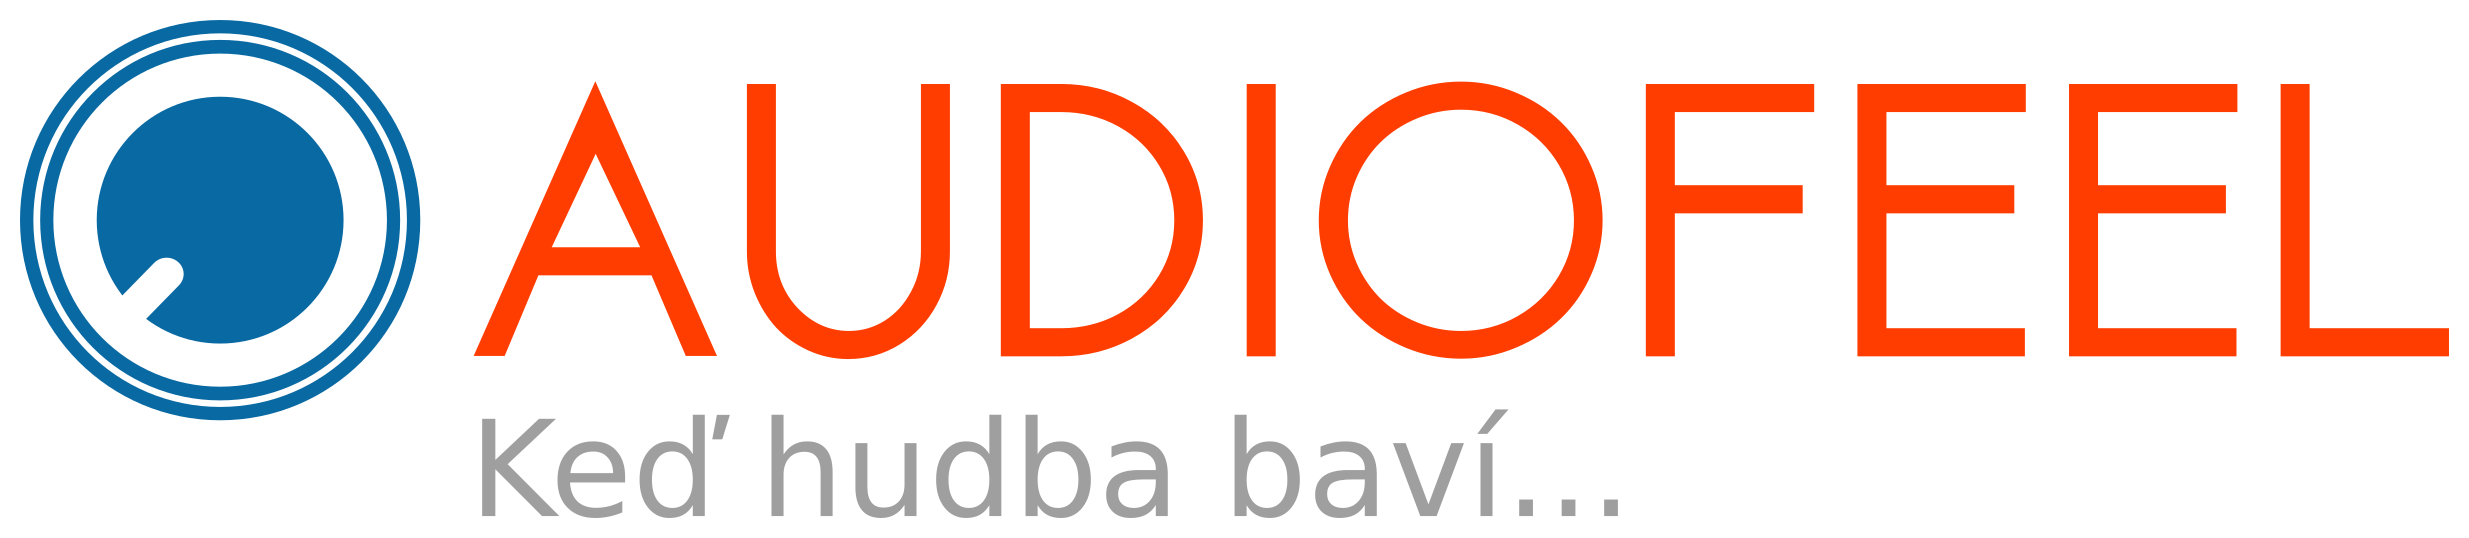 logo_audiofeel_600dpi.png